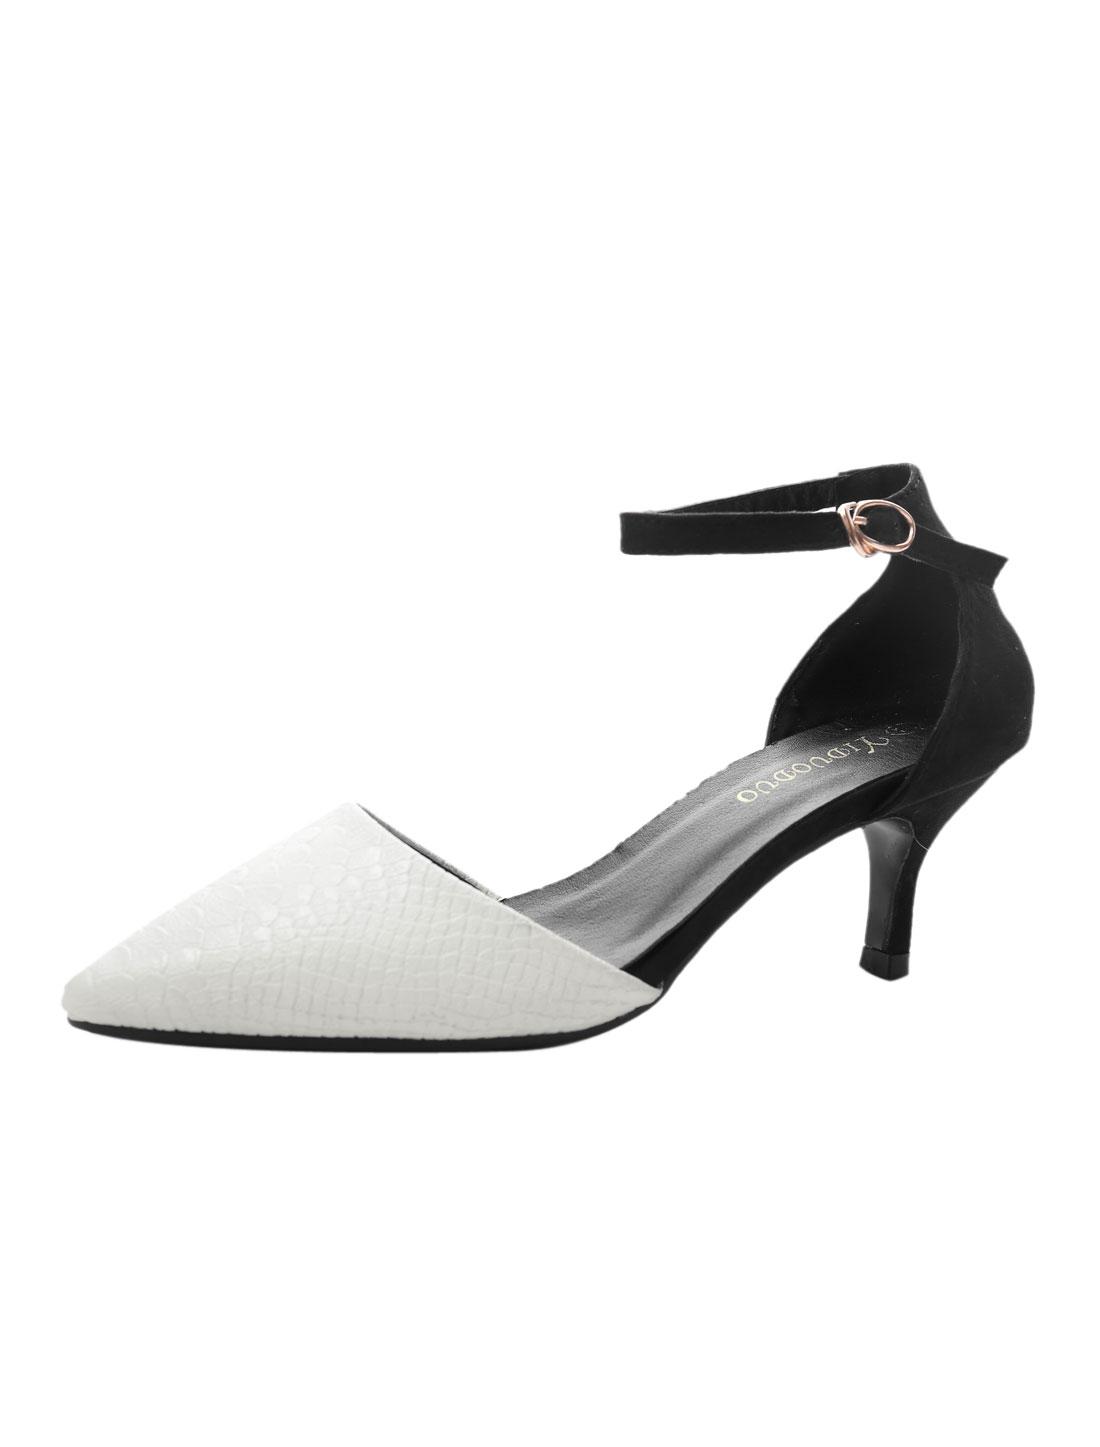 Ladies Ankle Straps Contrast Color Kitten Pumps White US 7